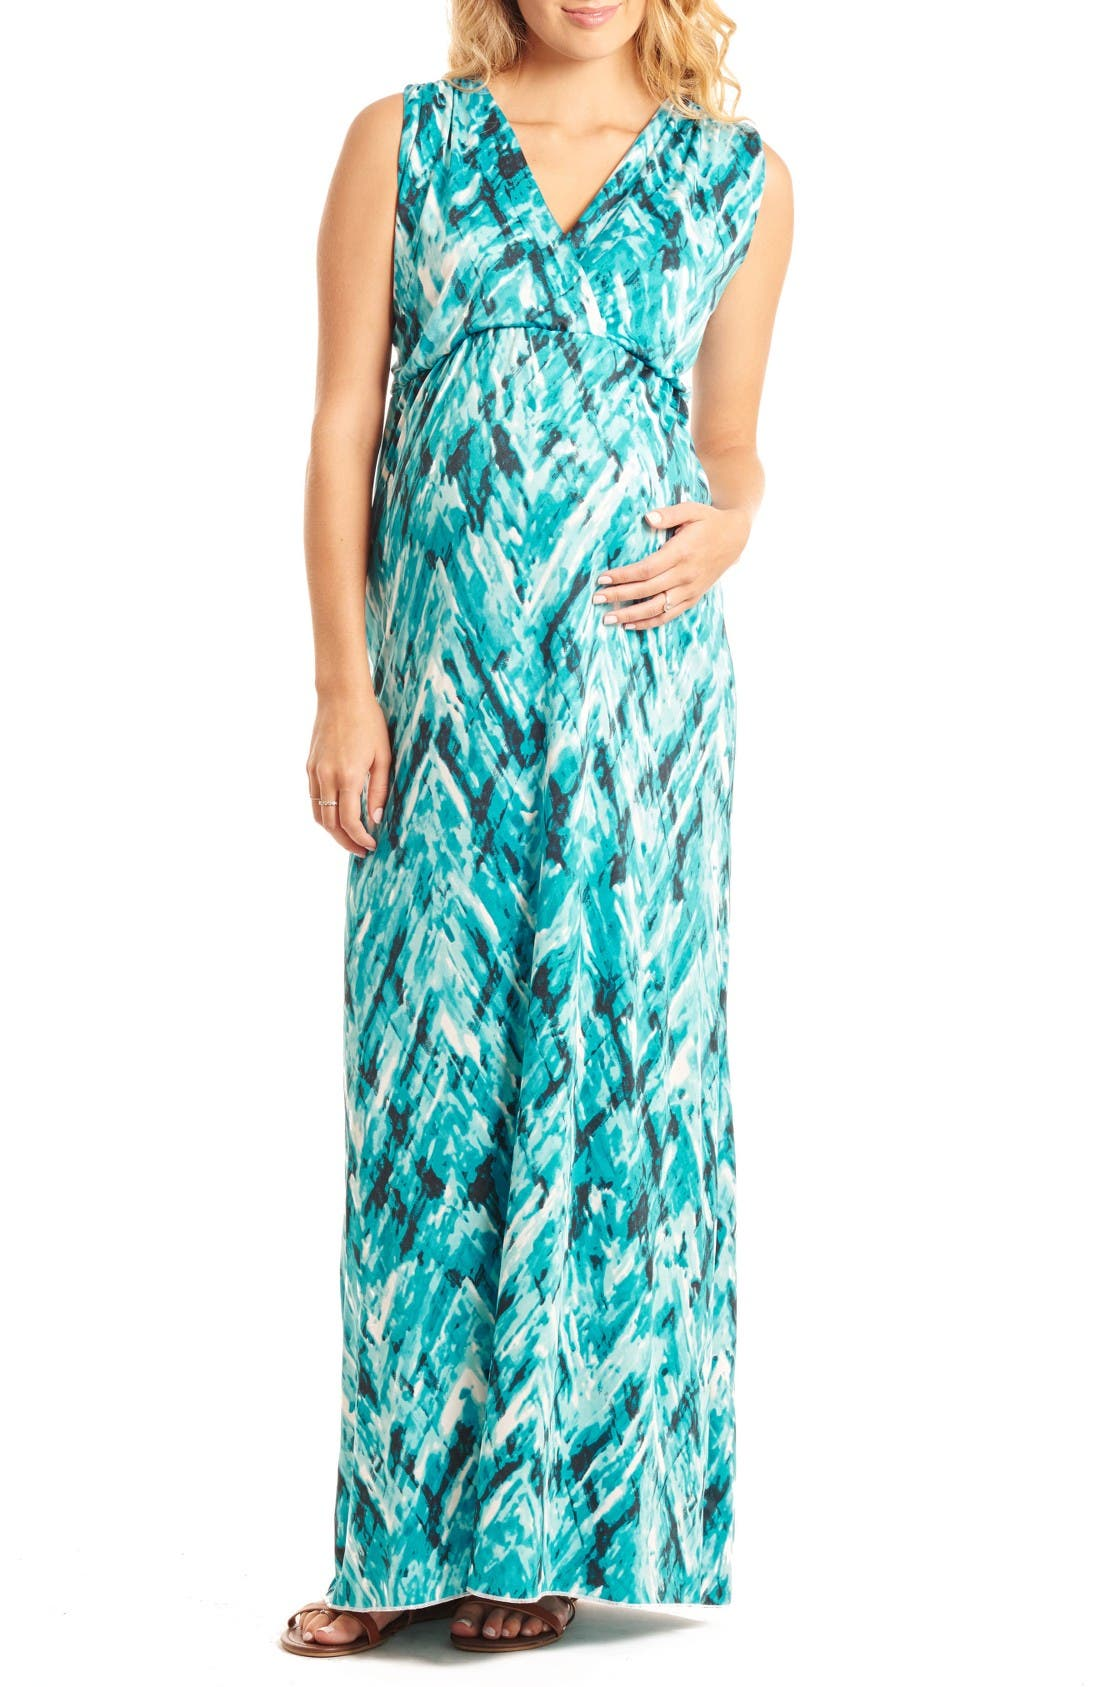 'Jill' Maternity Maxi Dress,                             Main thumbnail 1, color,                             Maui Blue